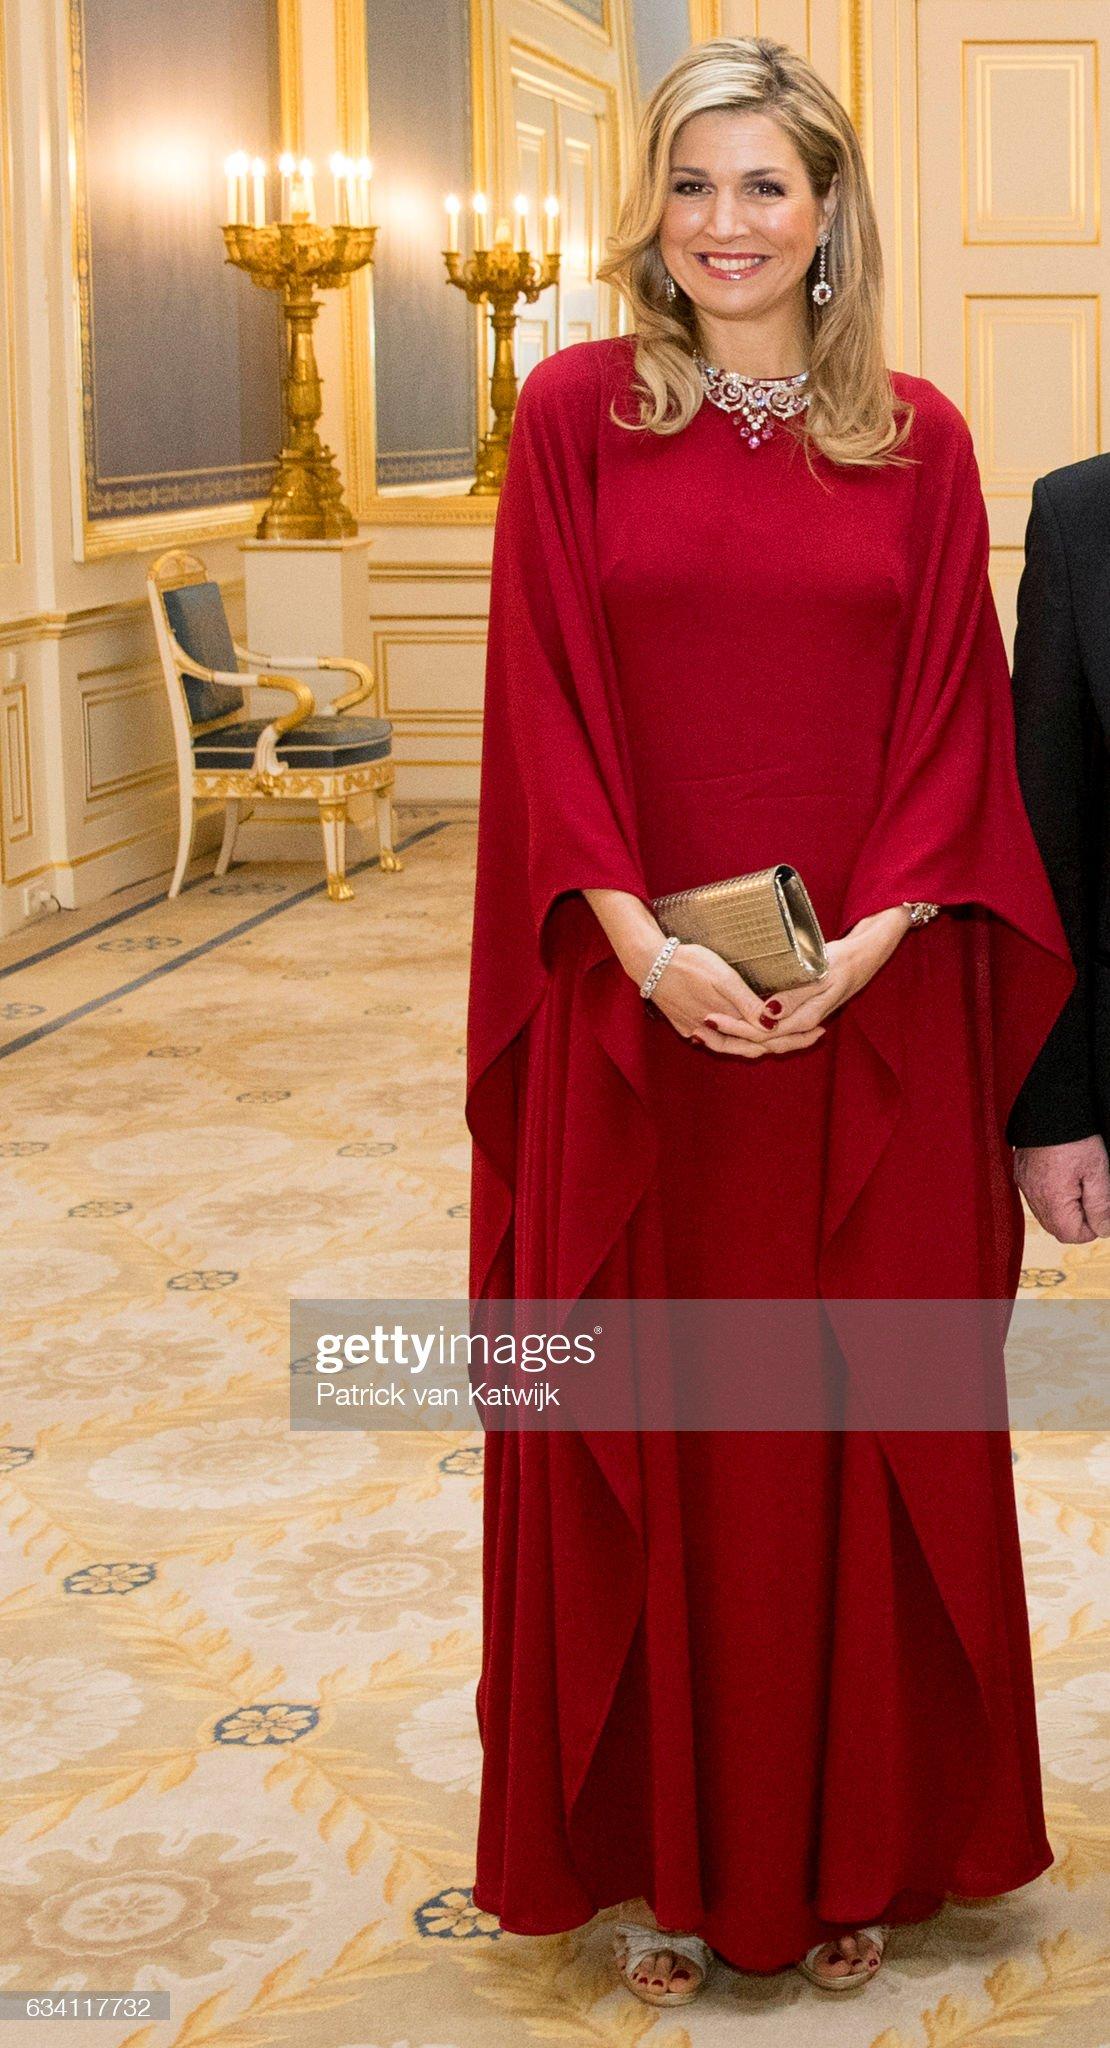 King Willem-Alexander and Queen Maxima host Dinner for German President Gauck : News Photo